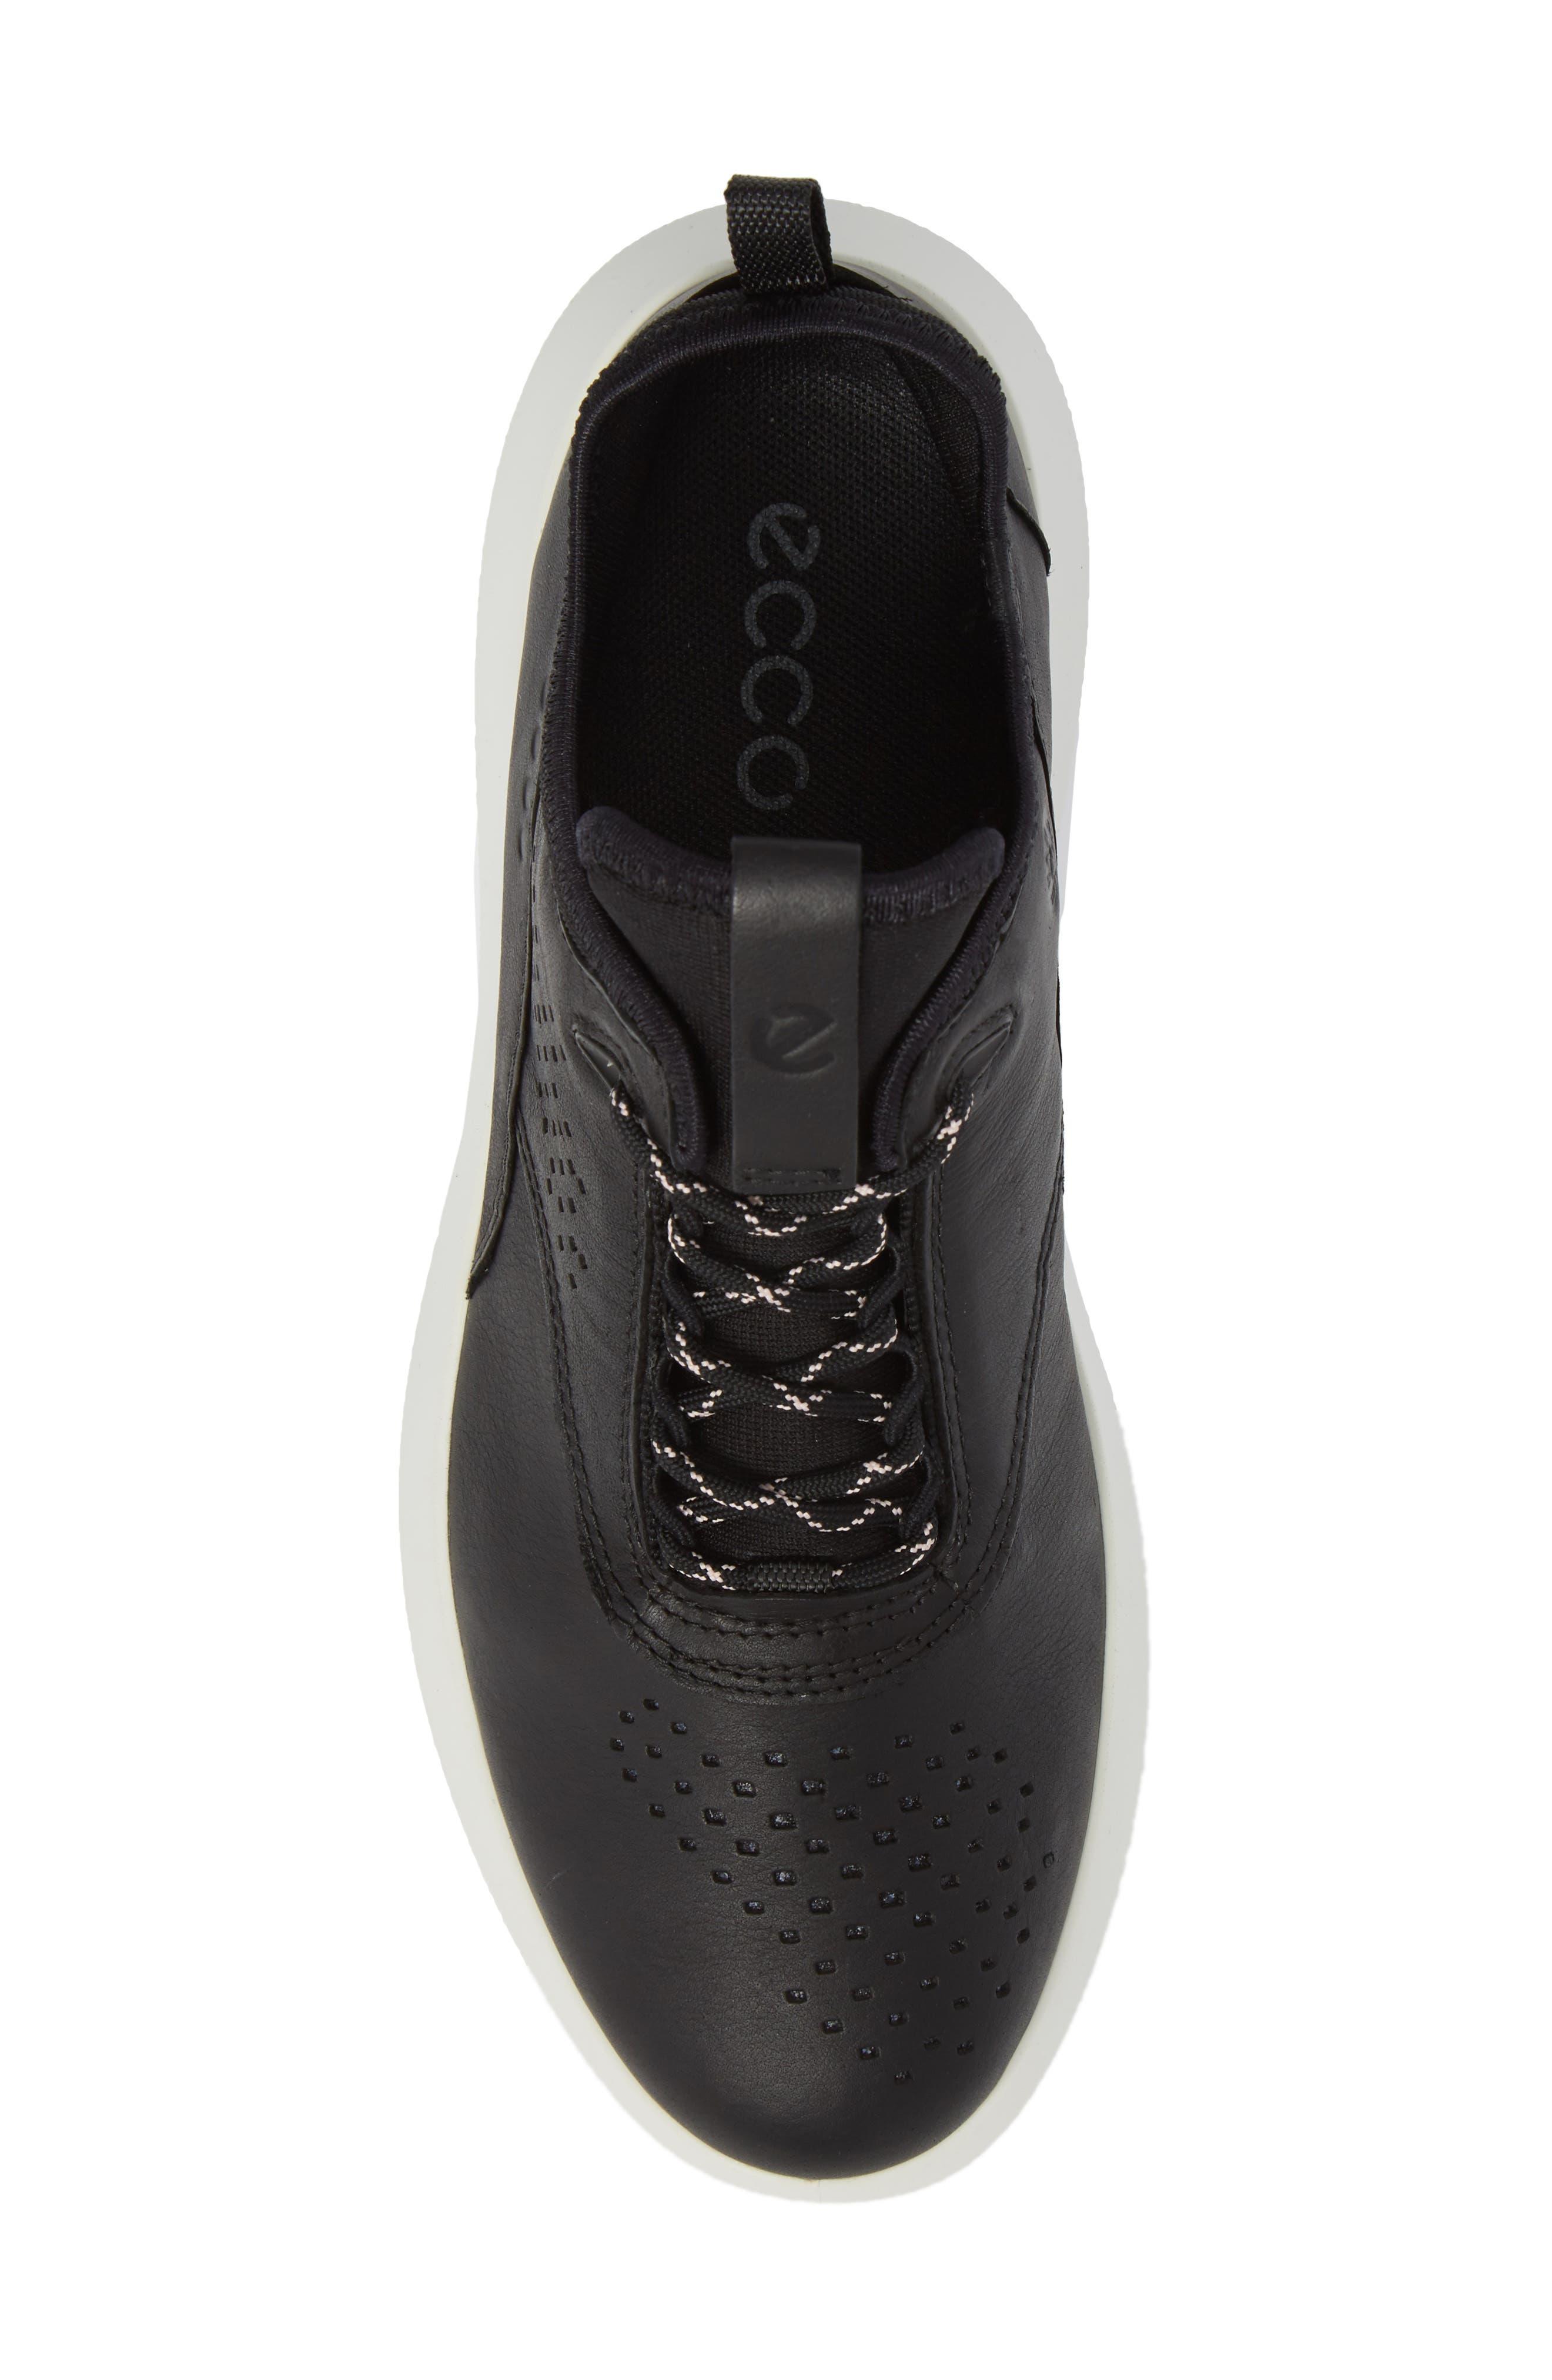 Scinapse Sneaker,                             Alternate thumbnail 5, color,                             BLACK LEATHER